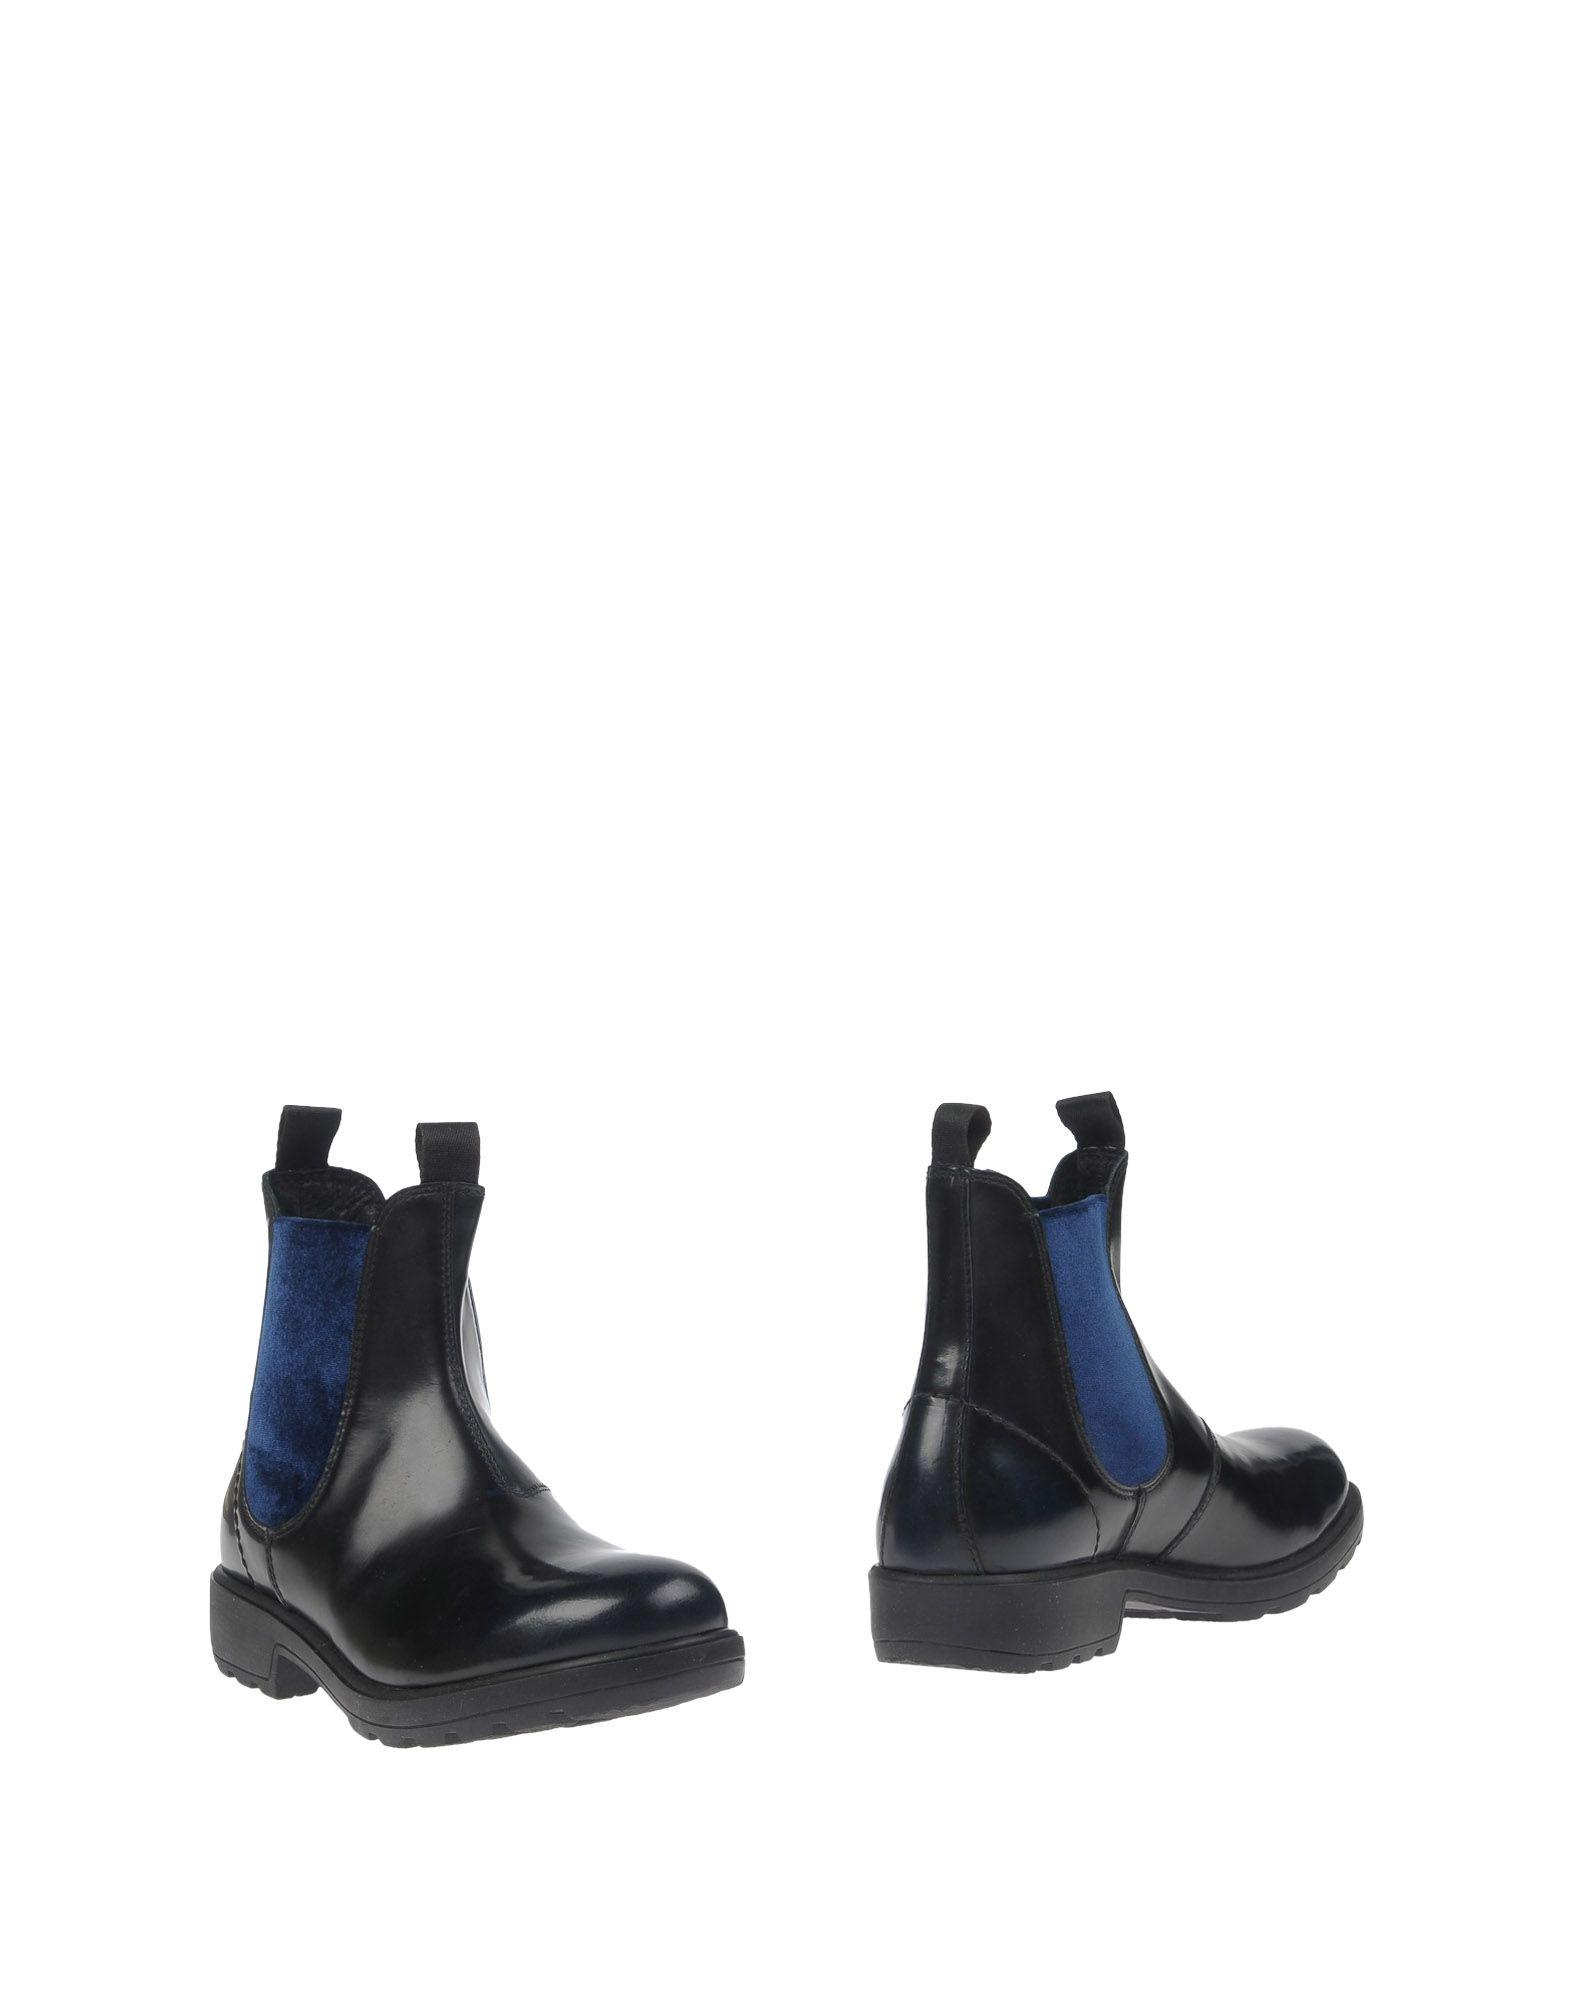 Docksteps Ankle Boot Boots - Women Docksteps Ankle Boots Boot online on  Australia - 11298572PF 6d54fe